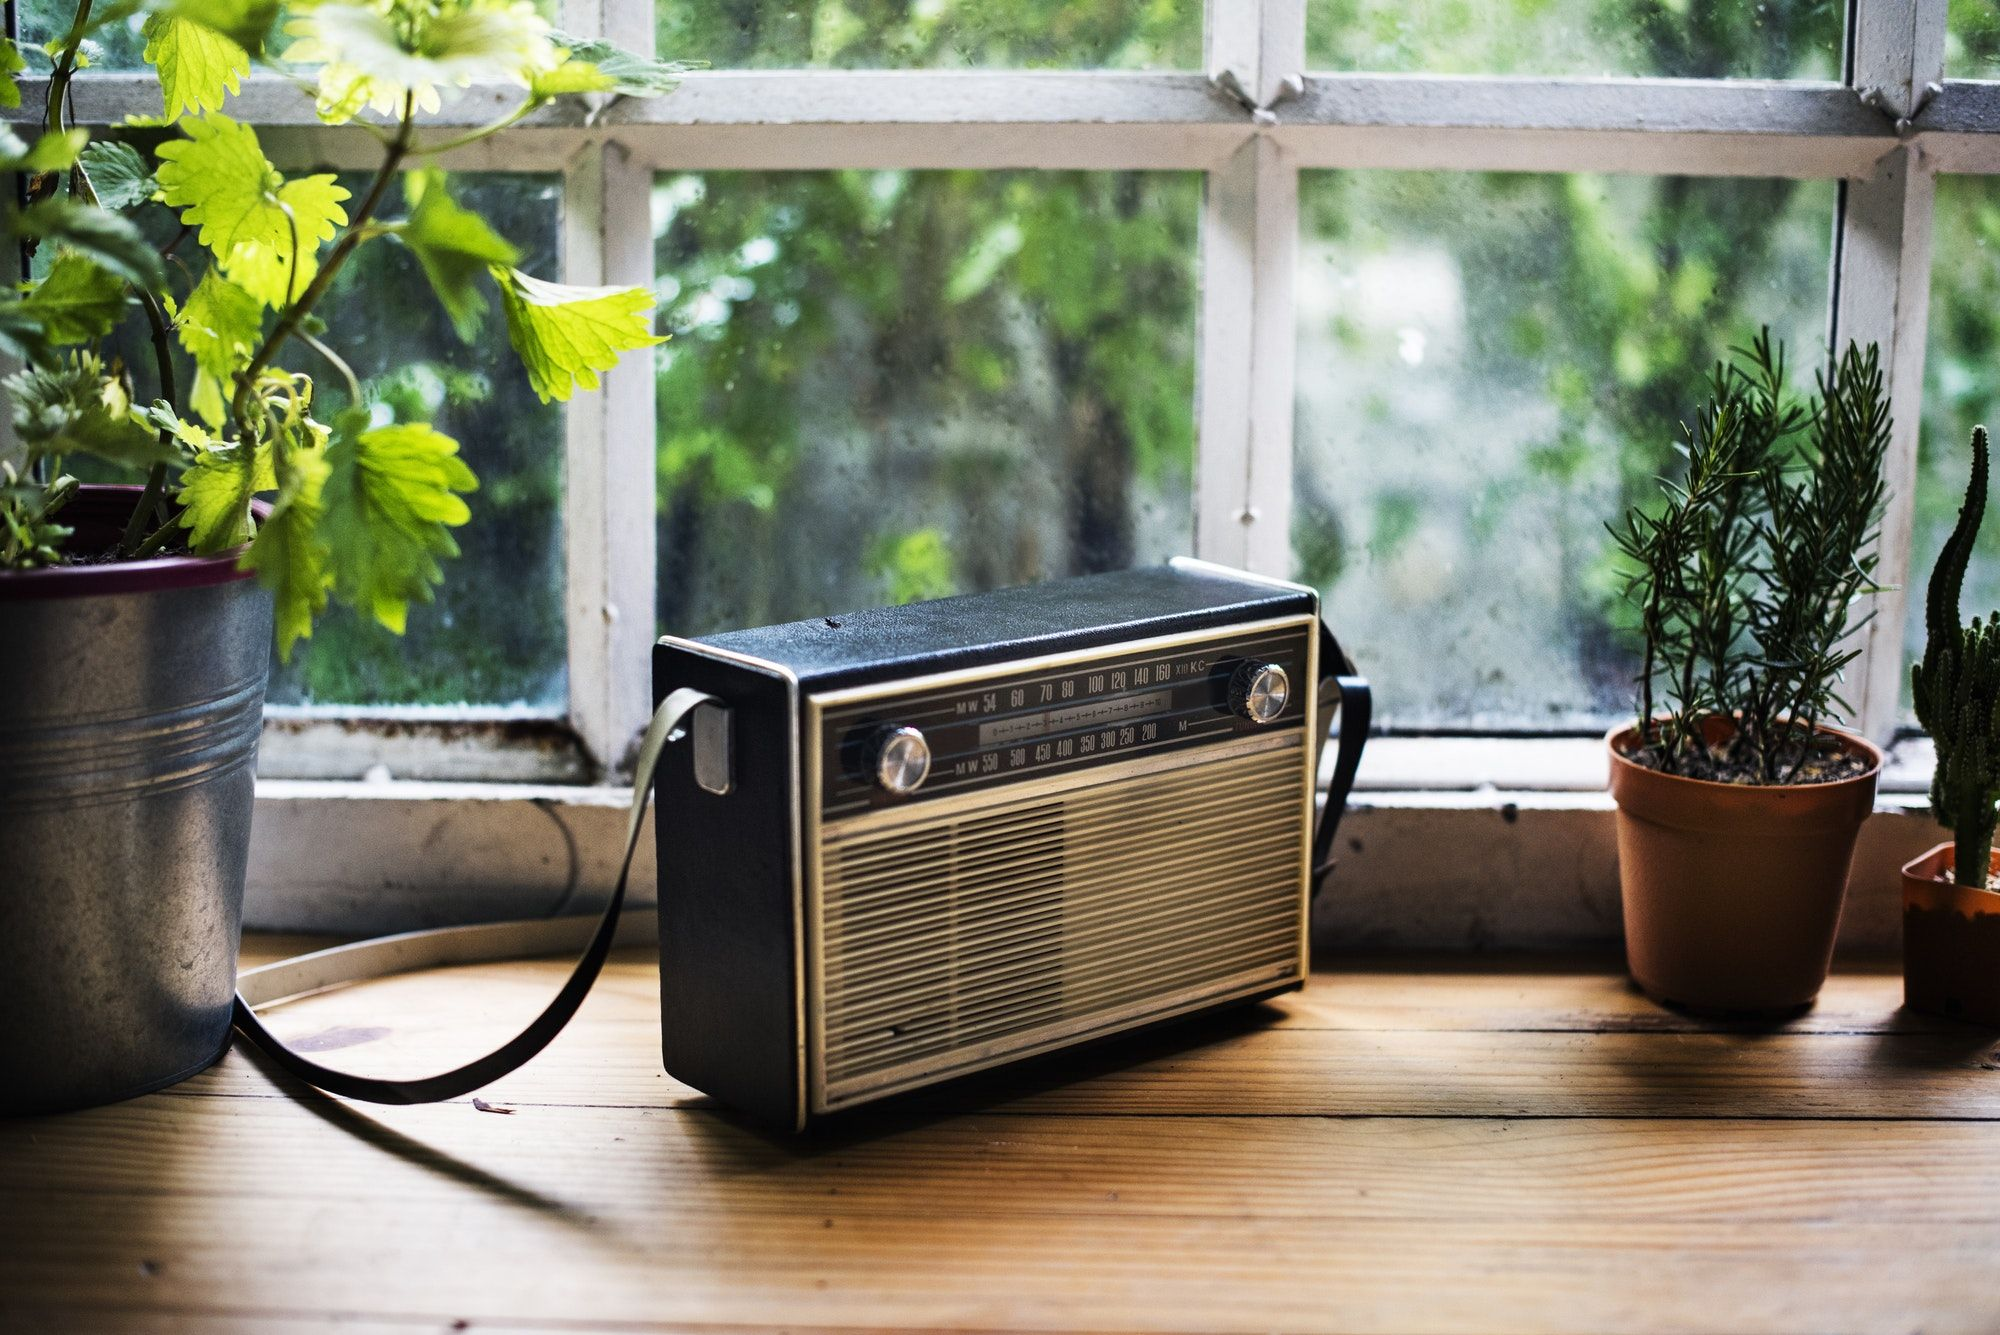 Closeup of vintage radio on wooden table